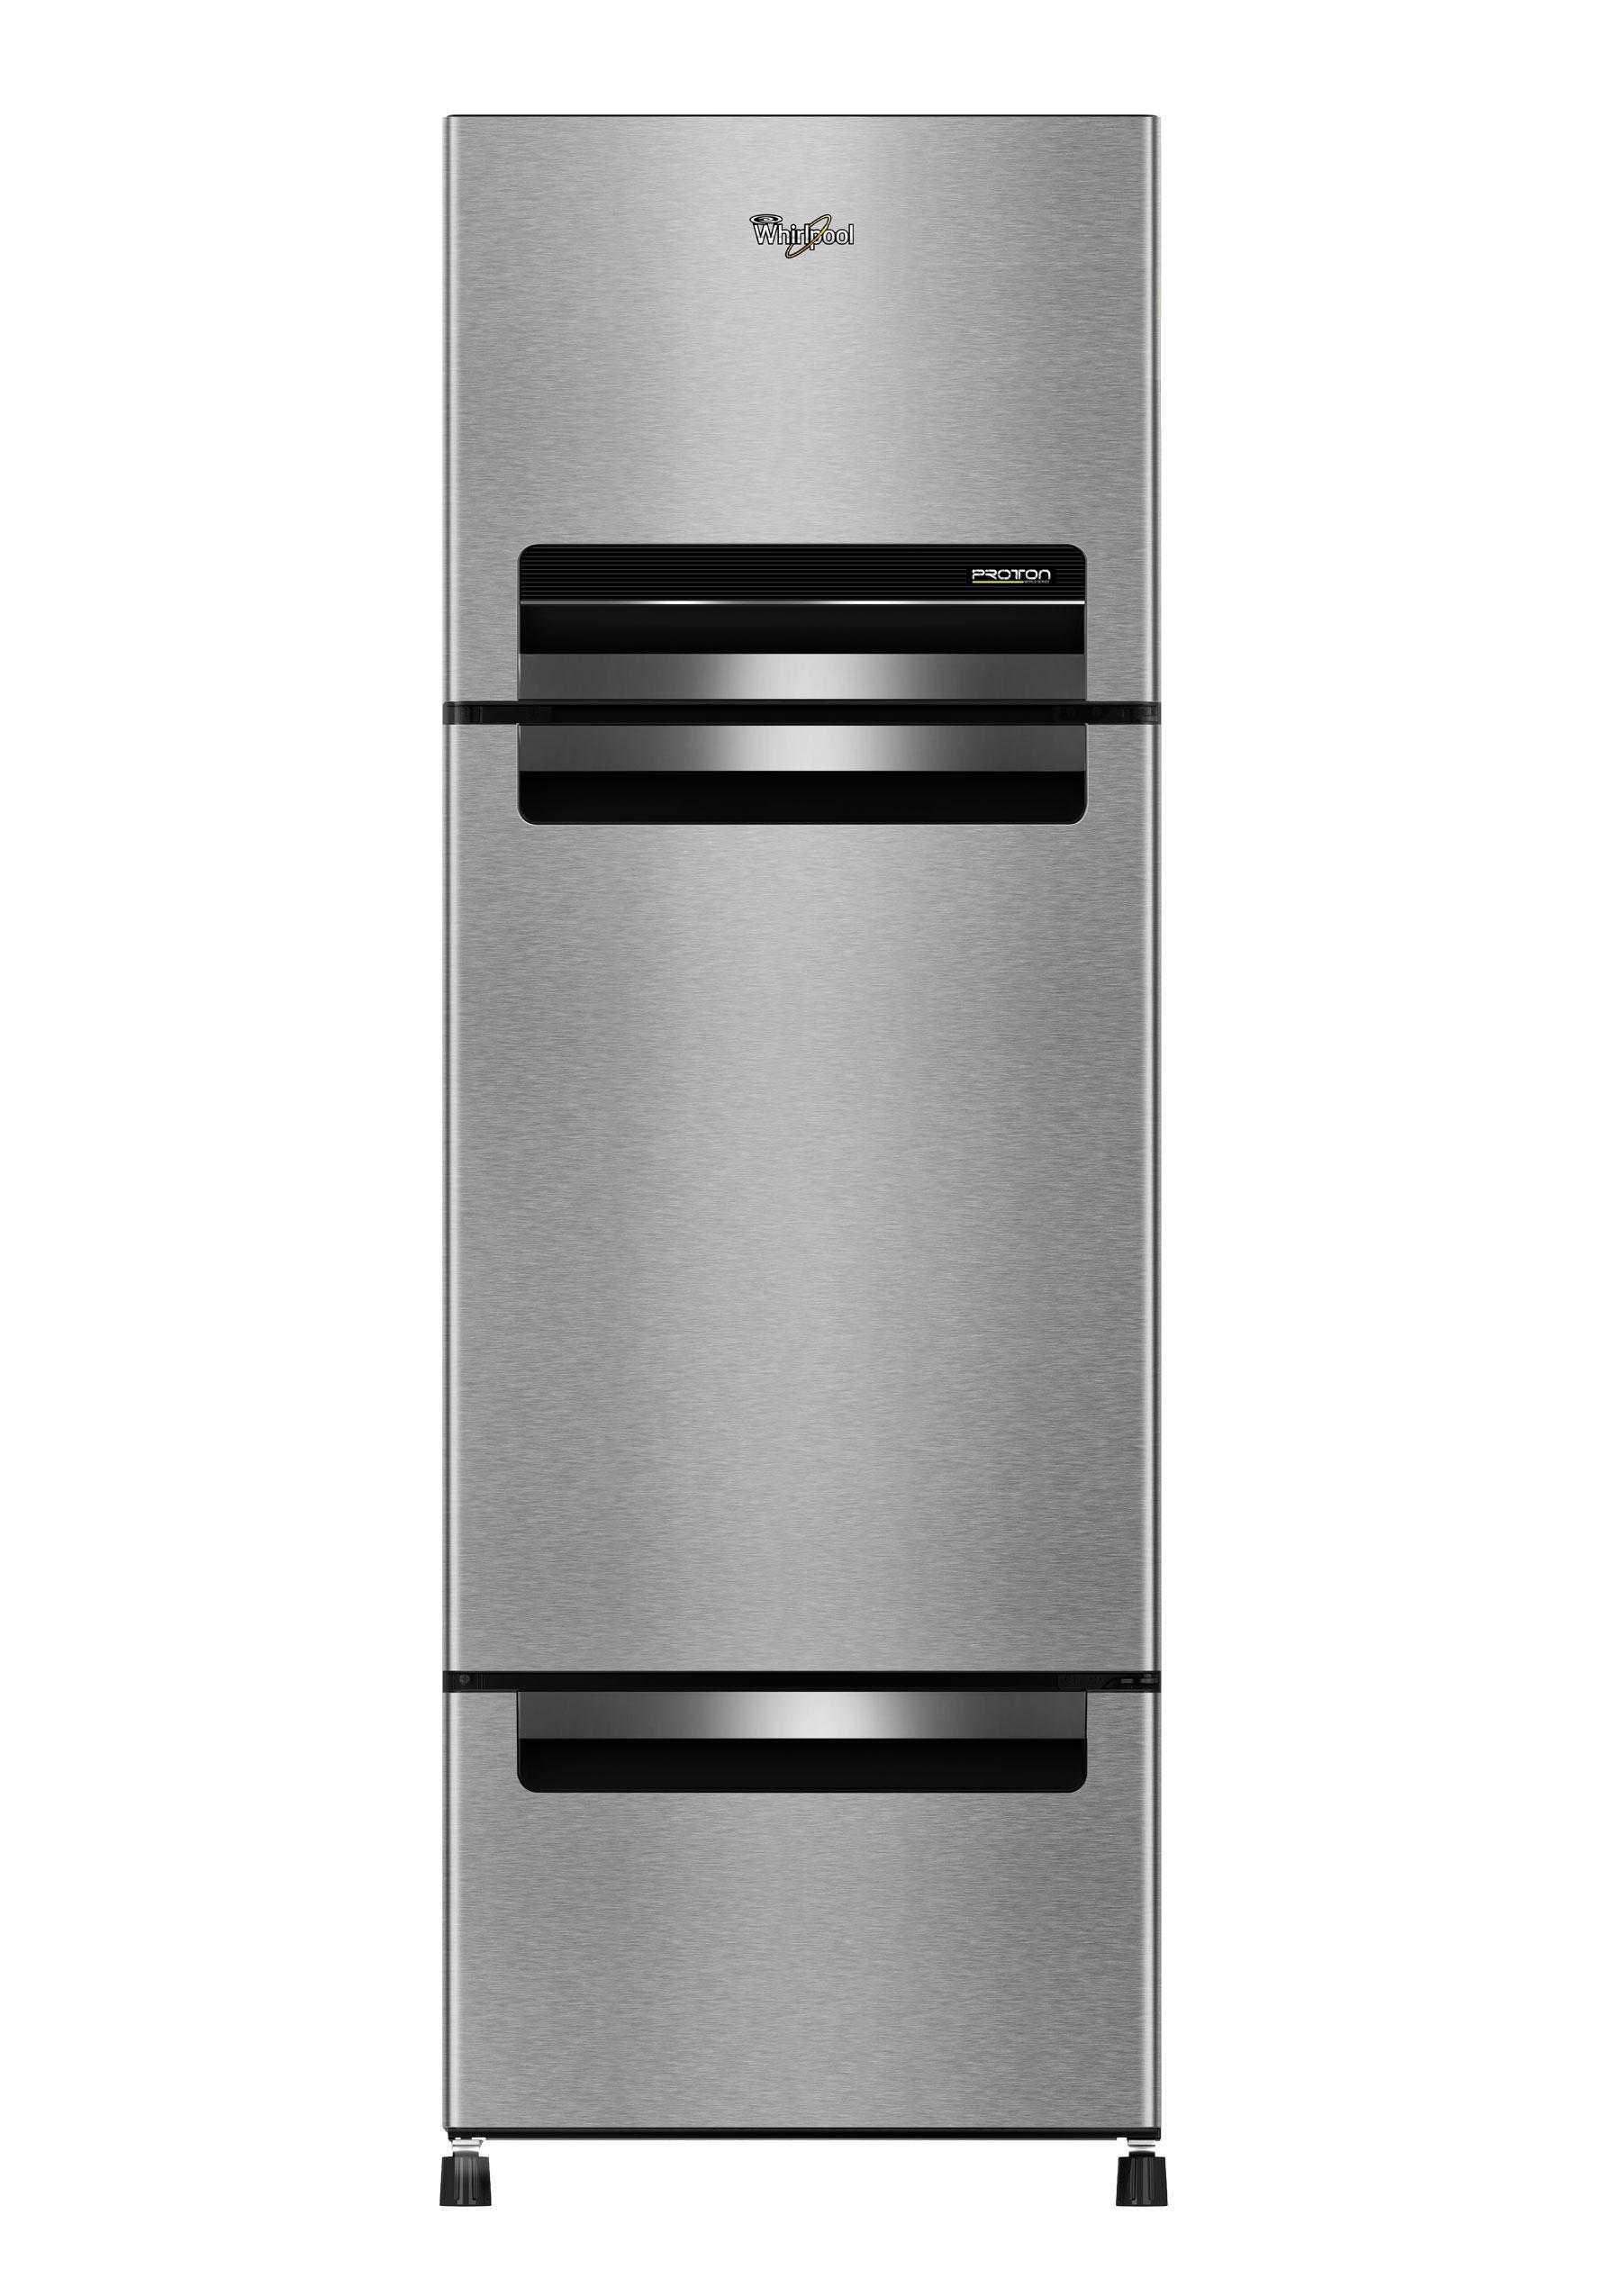 Whirlpool Triple Door Refrigerator Fp 283D Protton Image